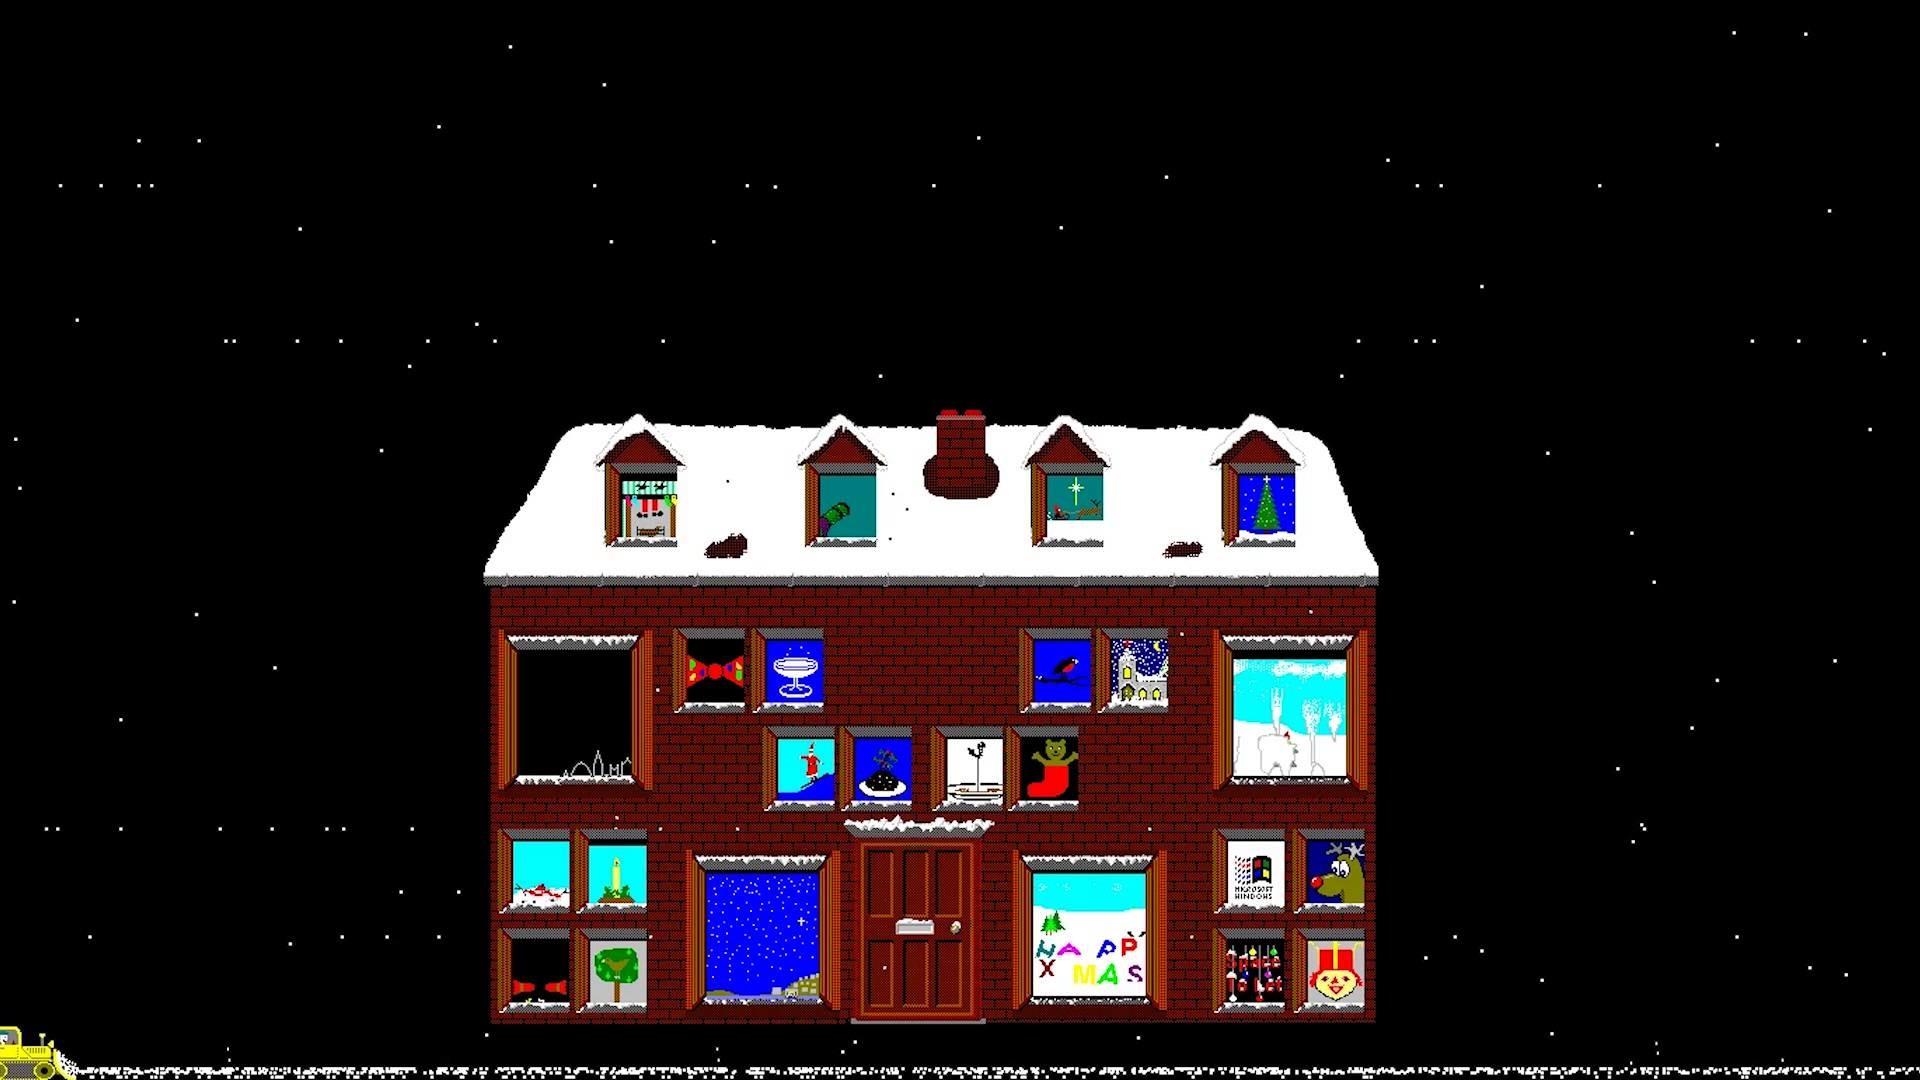 Download Final Fantasy Vii Advent Children wallpaper 270389 .